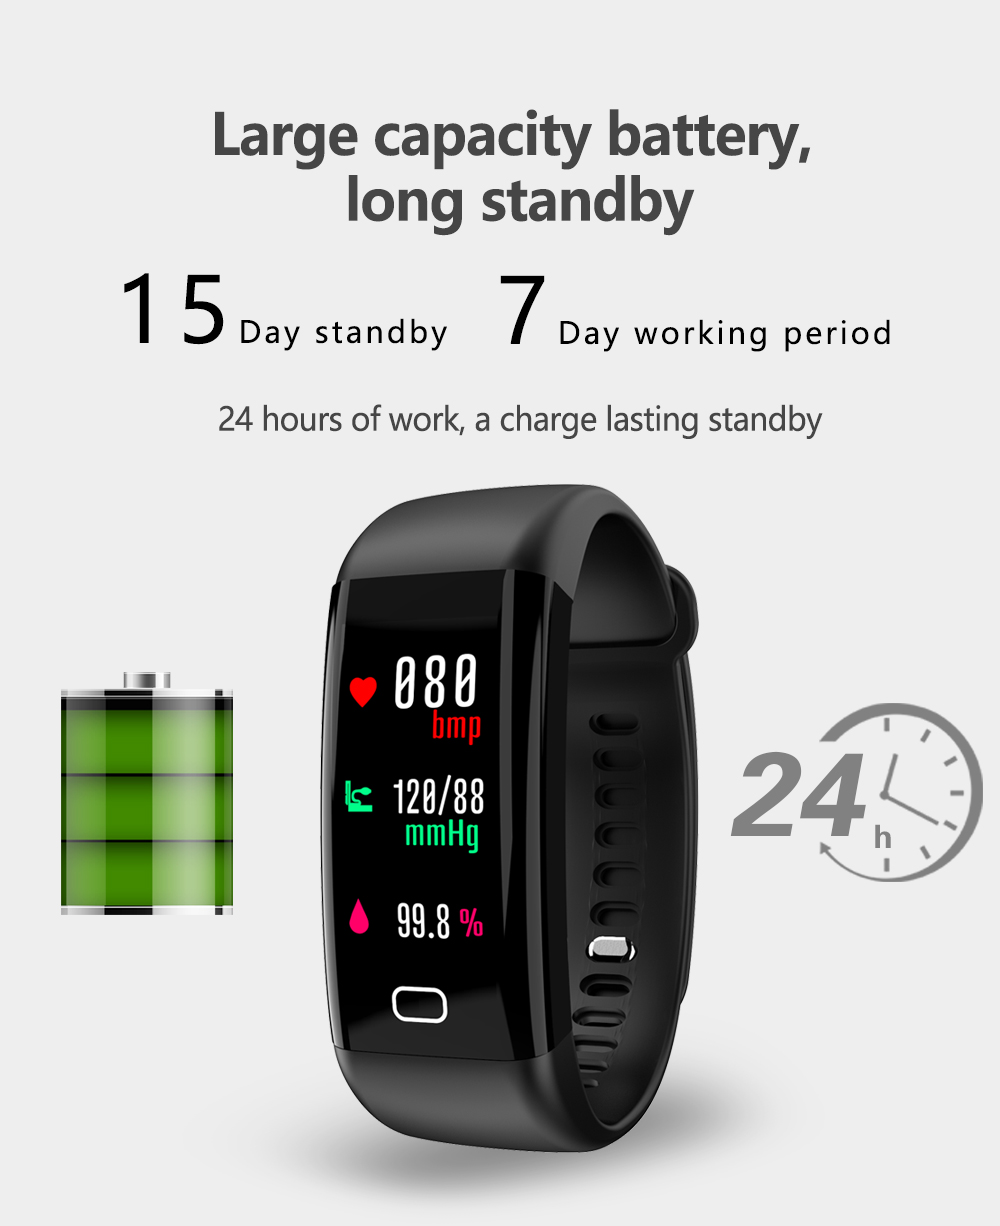 US $21 84 48% OFF|F07 Smart bracelet heart rate monitor Blood Pressure  Oxygen Fitness Tracker pulsera smartband sport watch PK xiaomi mi band 2  3-in